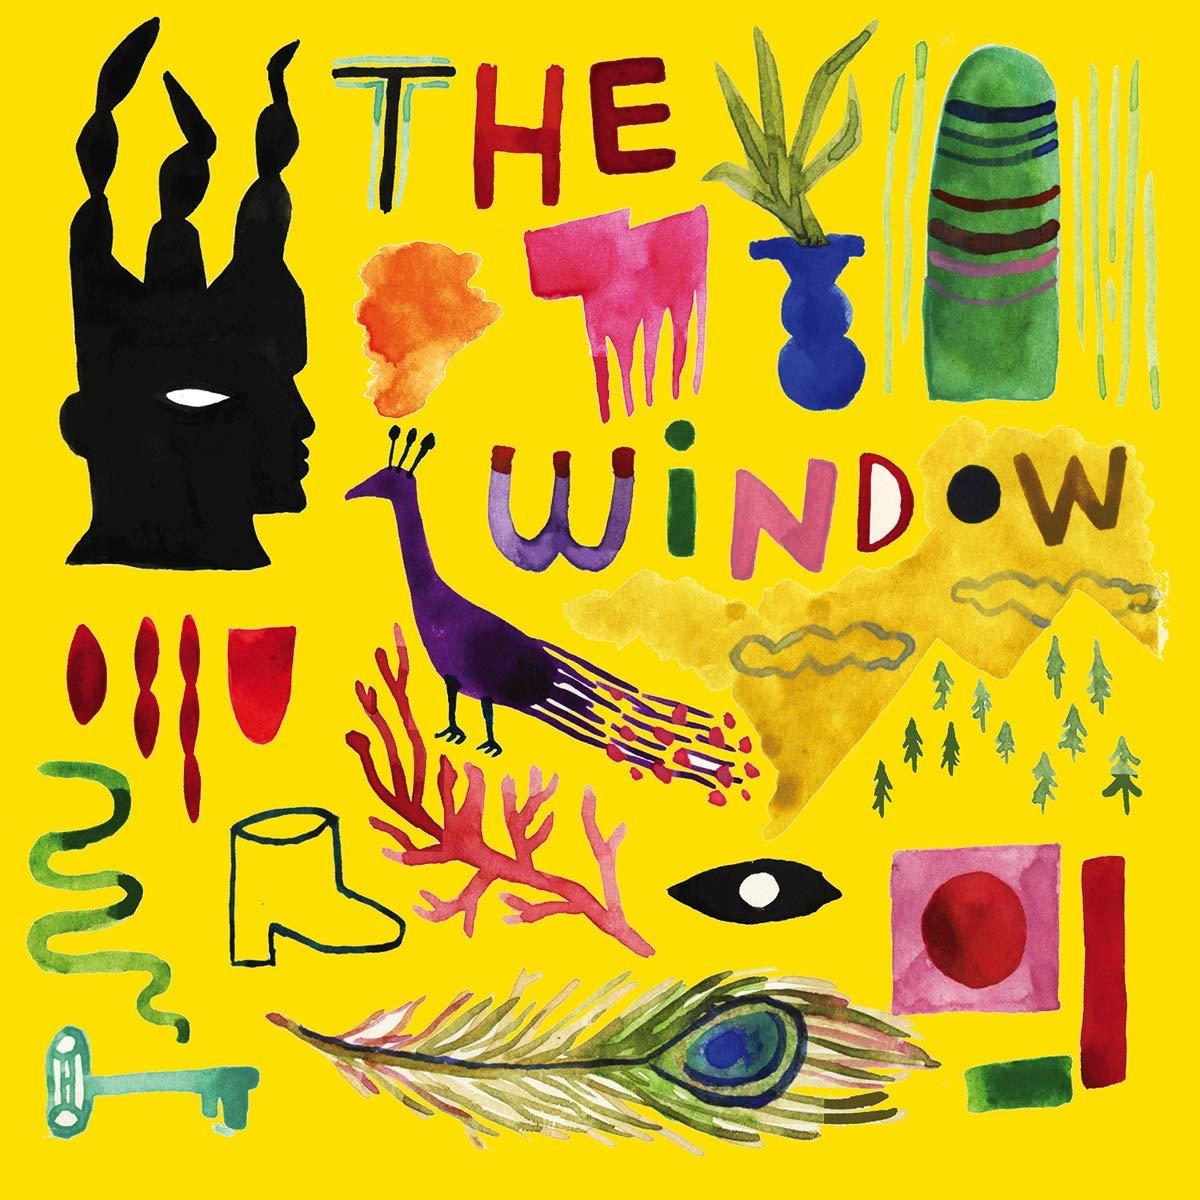 Resultat d'imatges de cecile mclorin salvant the window